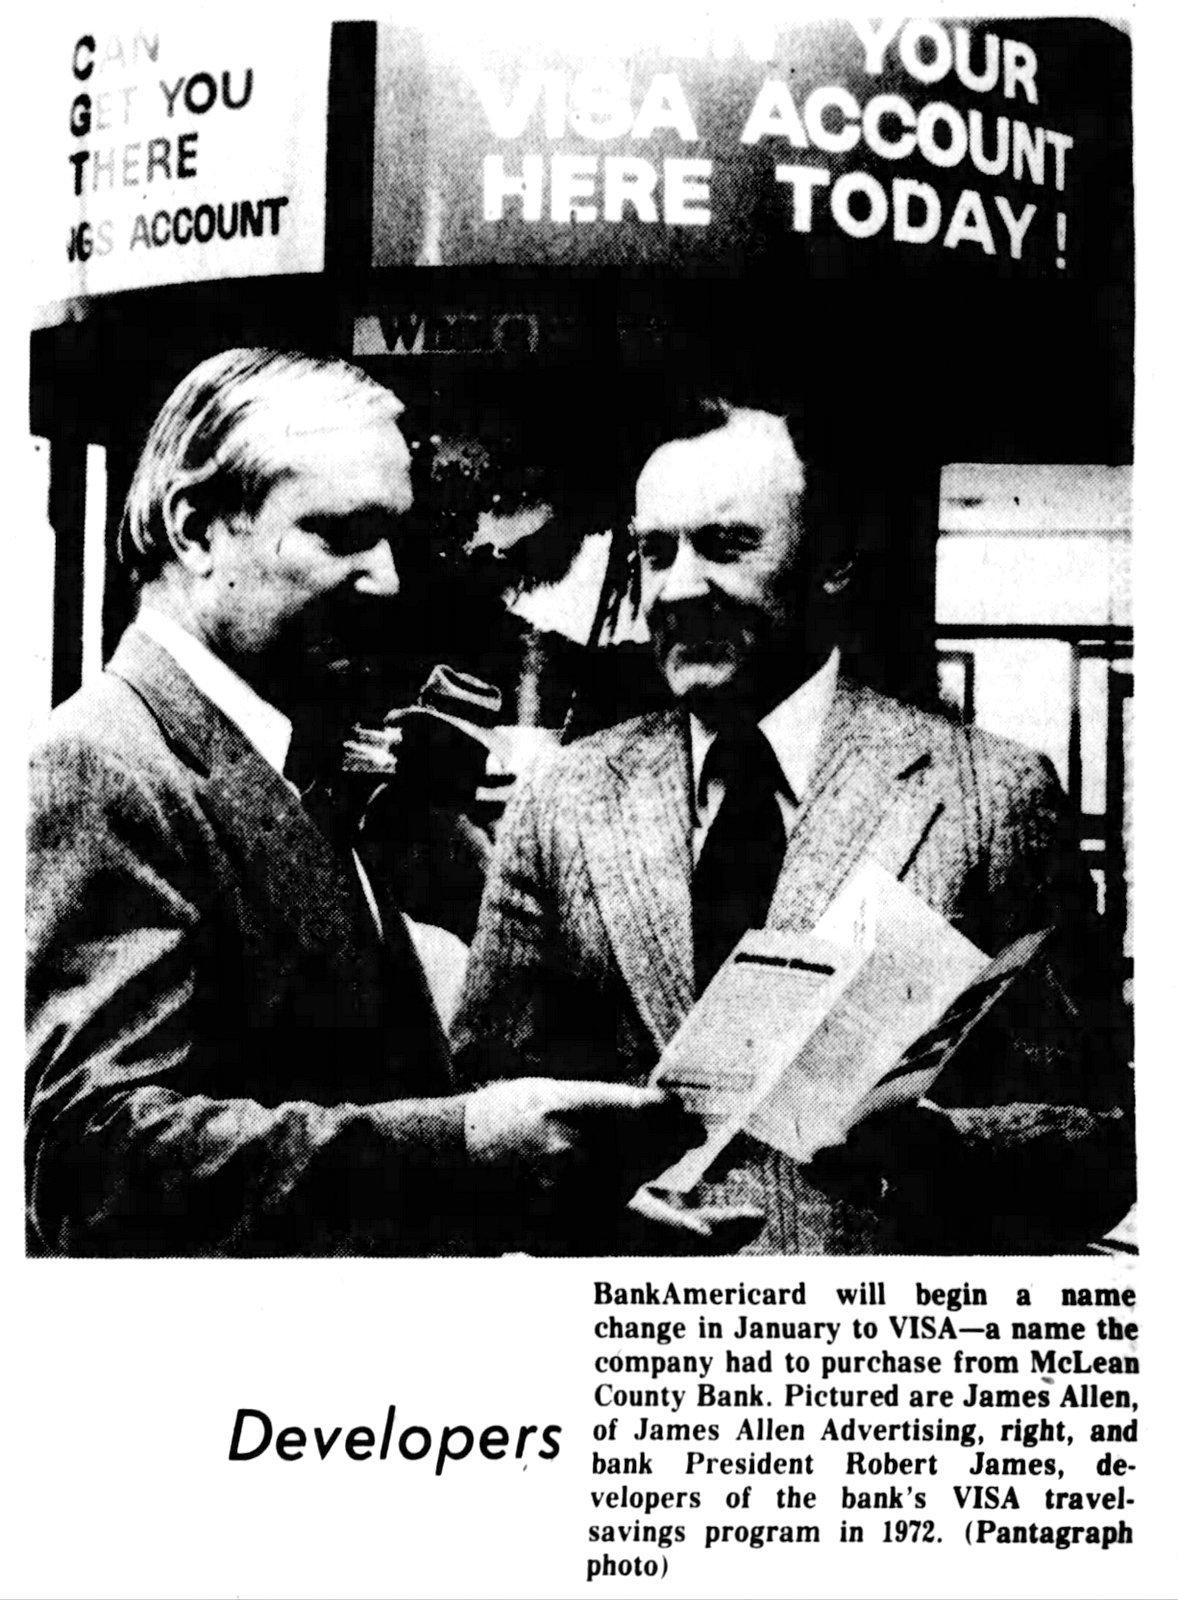 Visa passport to bank windfall (1976)